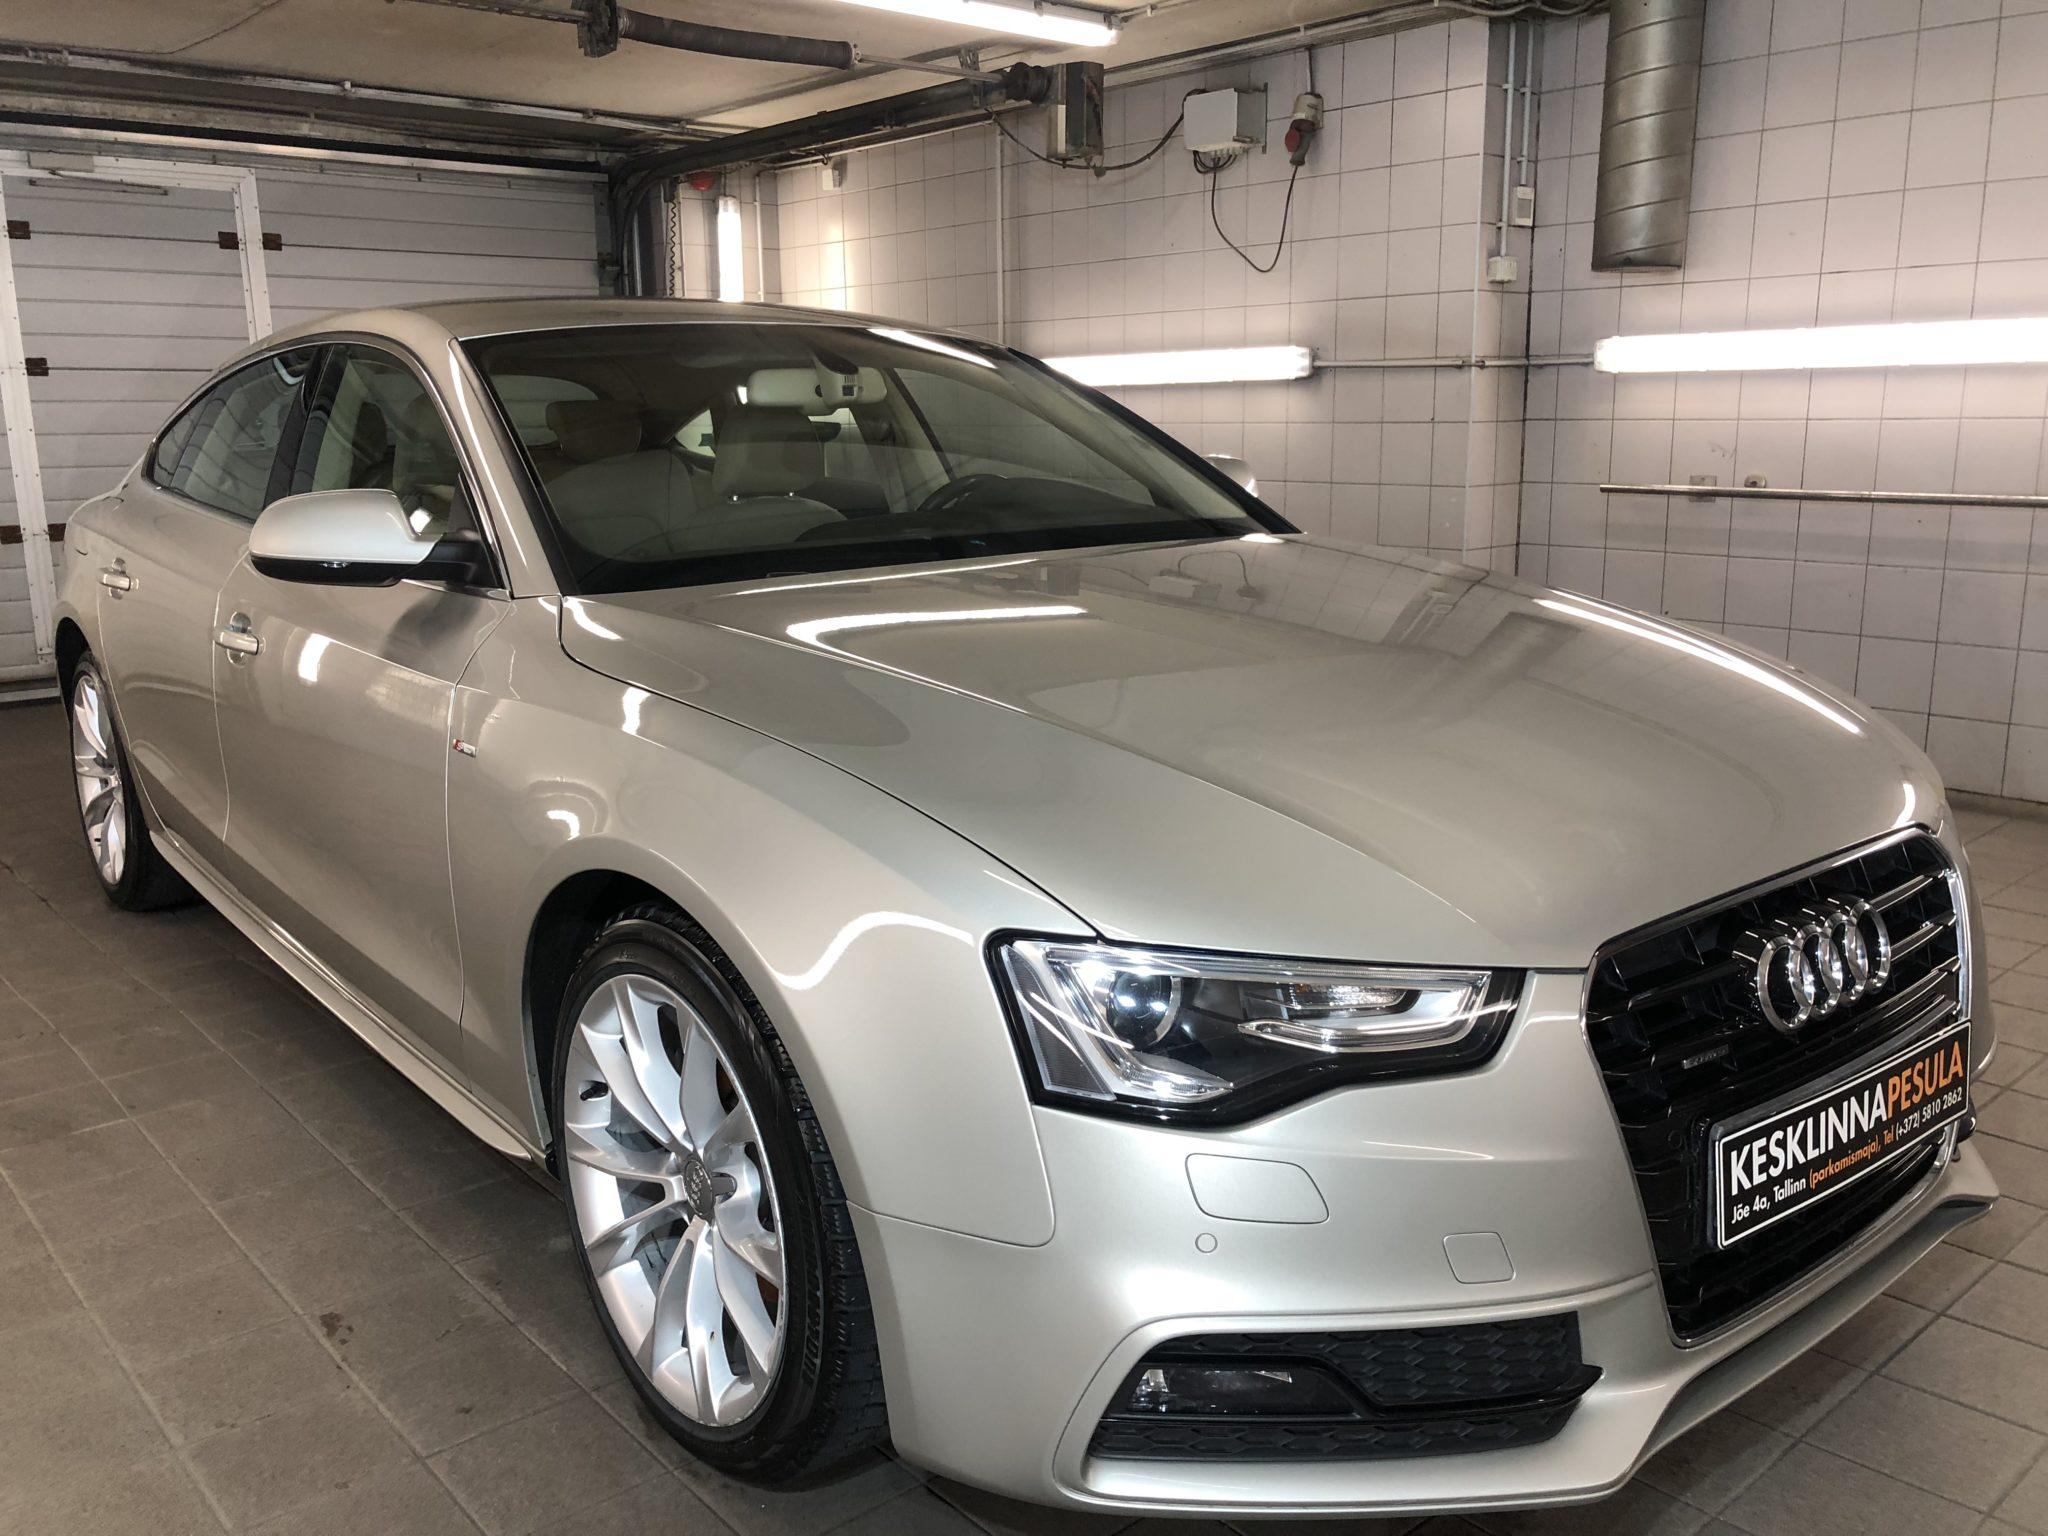 Pigieemaldus pesu - Audi A5